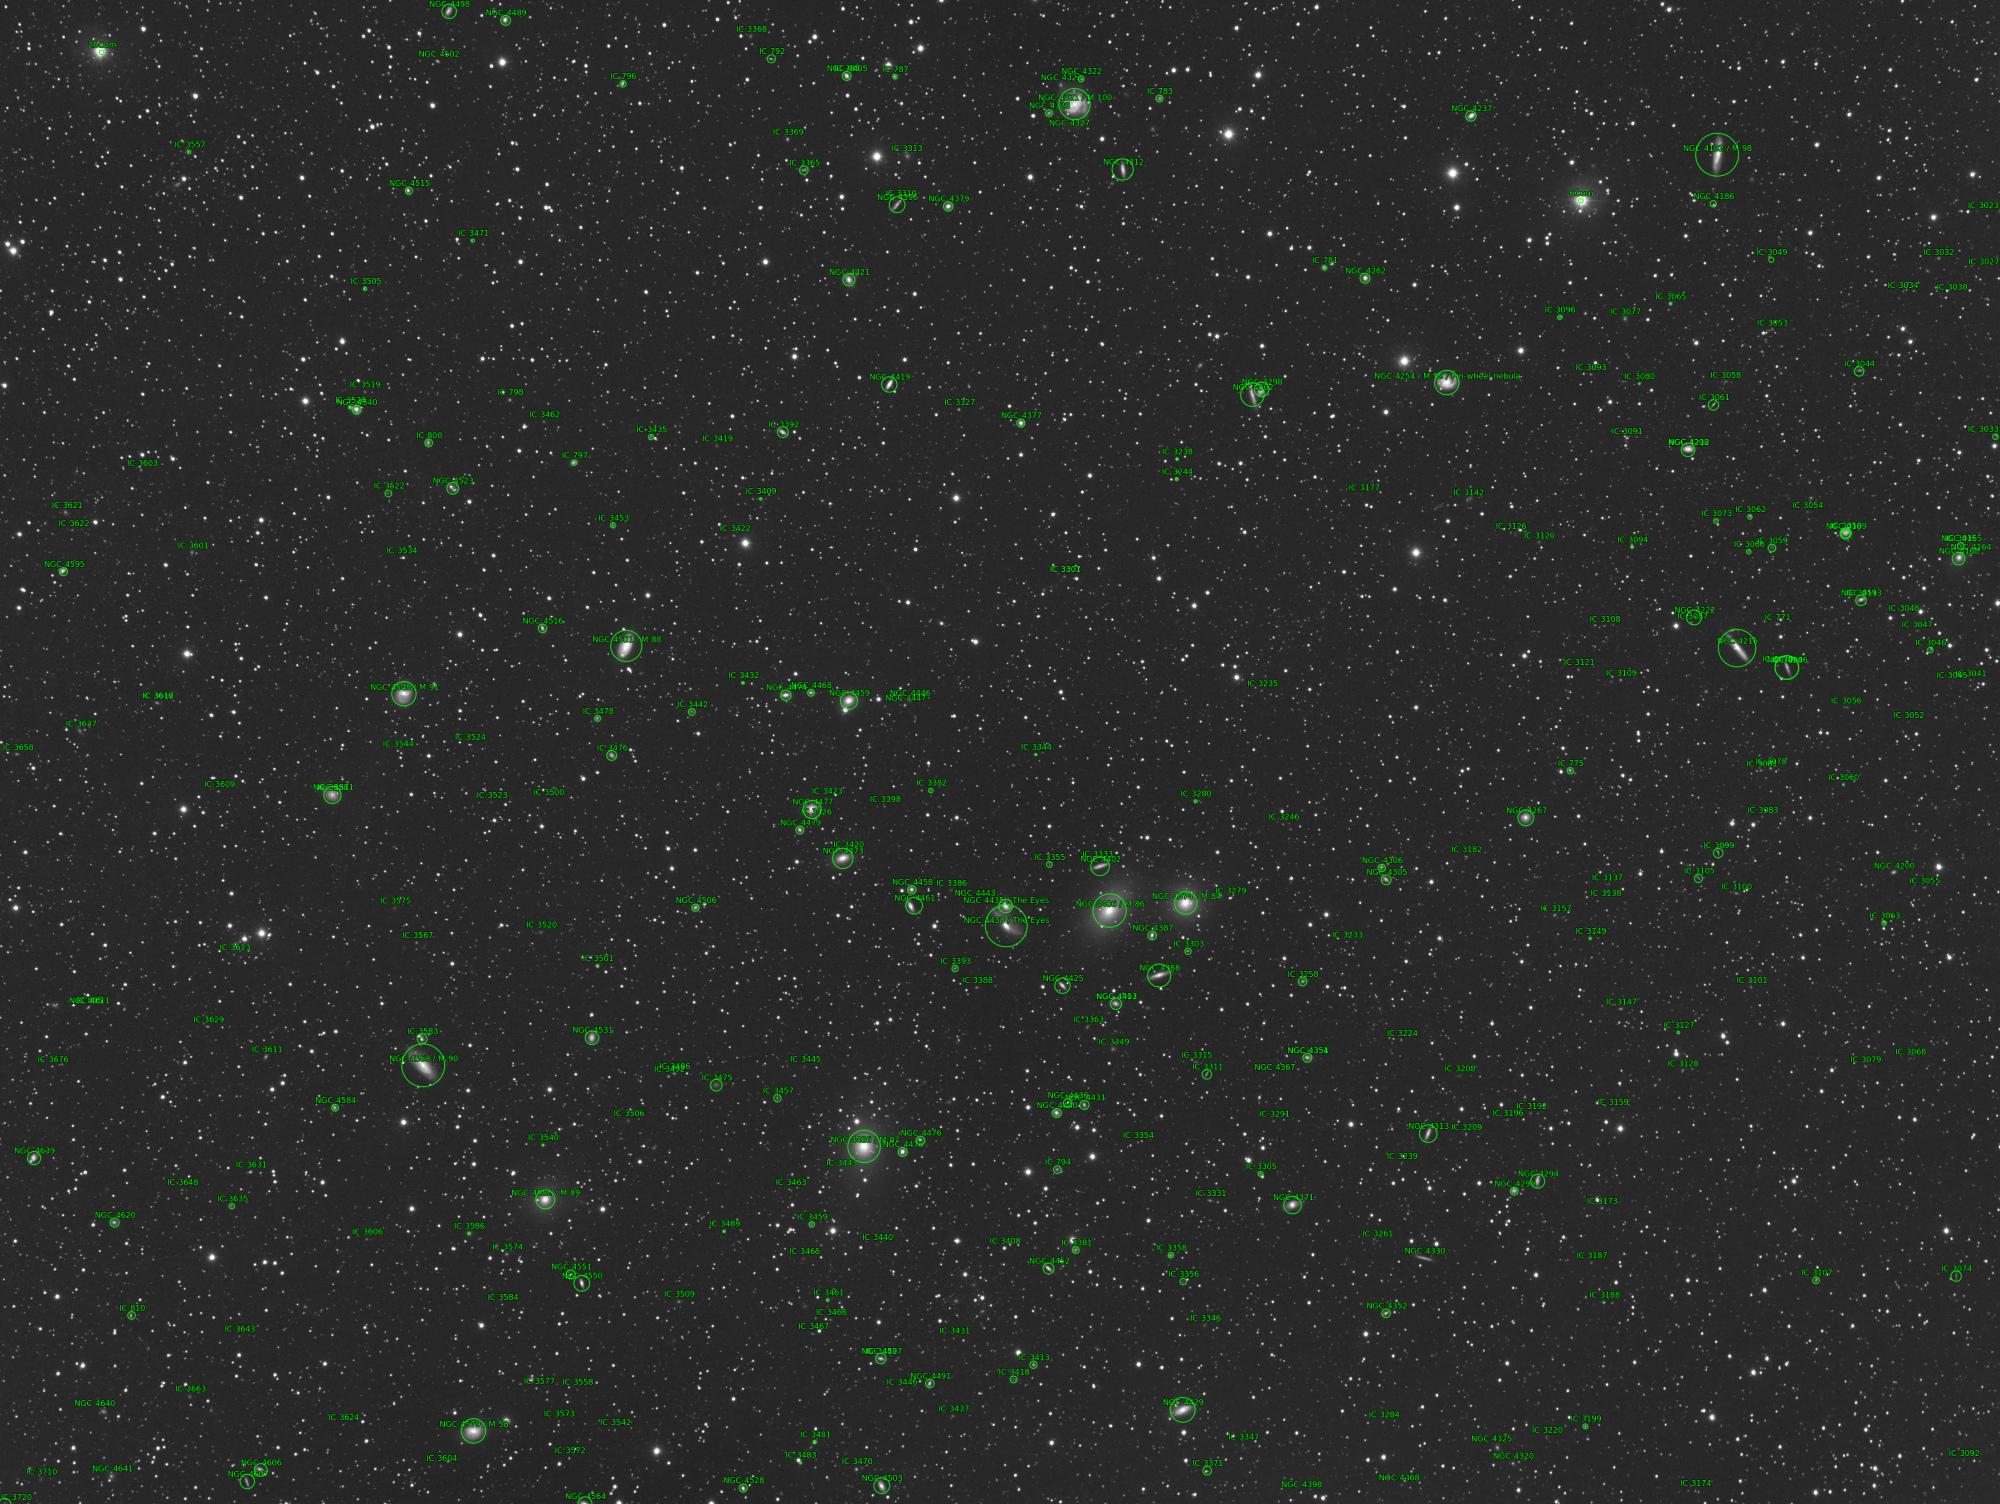 5c97e4556c3e0_Samyang135mm-VirgoCluster-L-56x300s-4h40-DF-2-Processed-Annotated.thumb.jpg.f7964636a18edbb0dec4a768fc583fdd.jpg